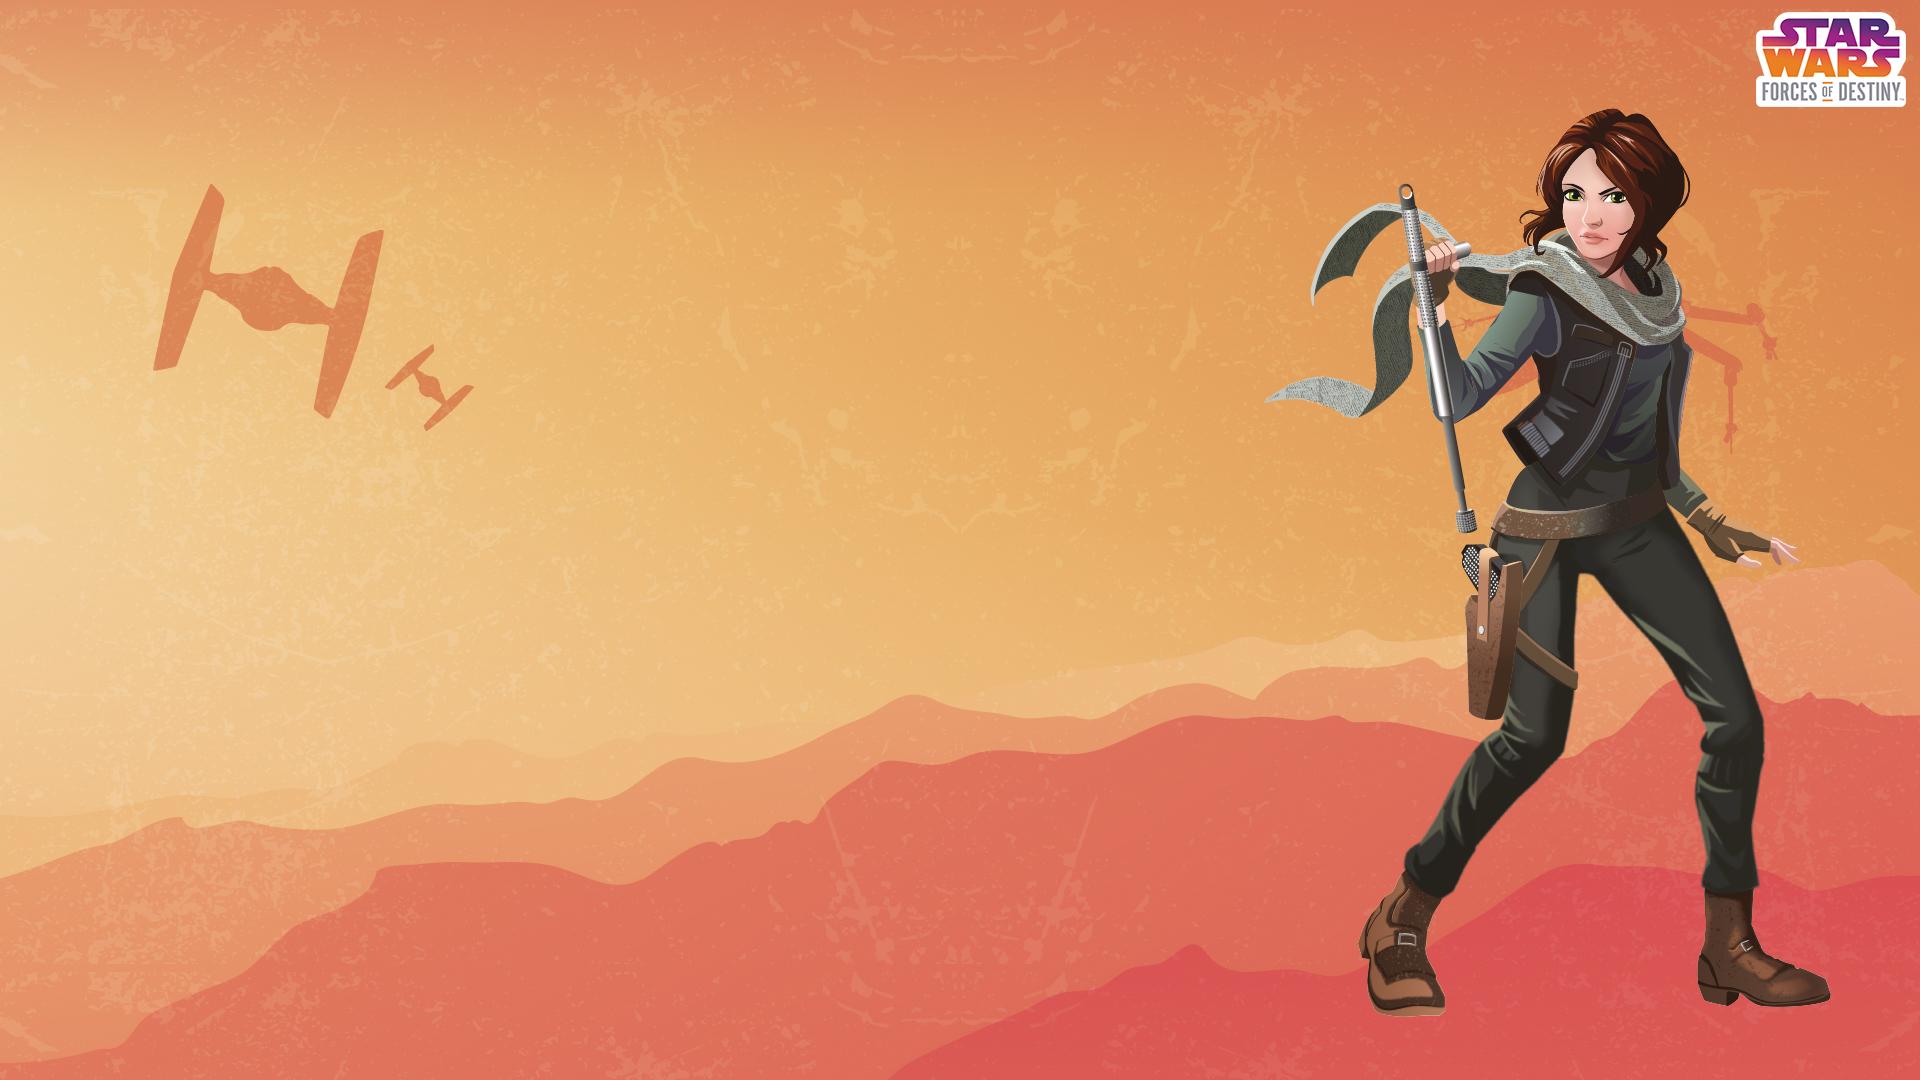 Star Wars Forces Of Destiny Desktop Wallpapers Youloveitcom